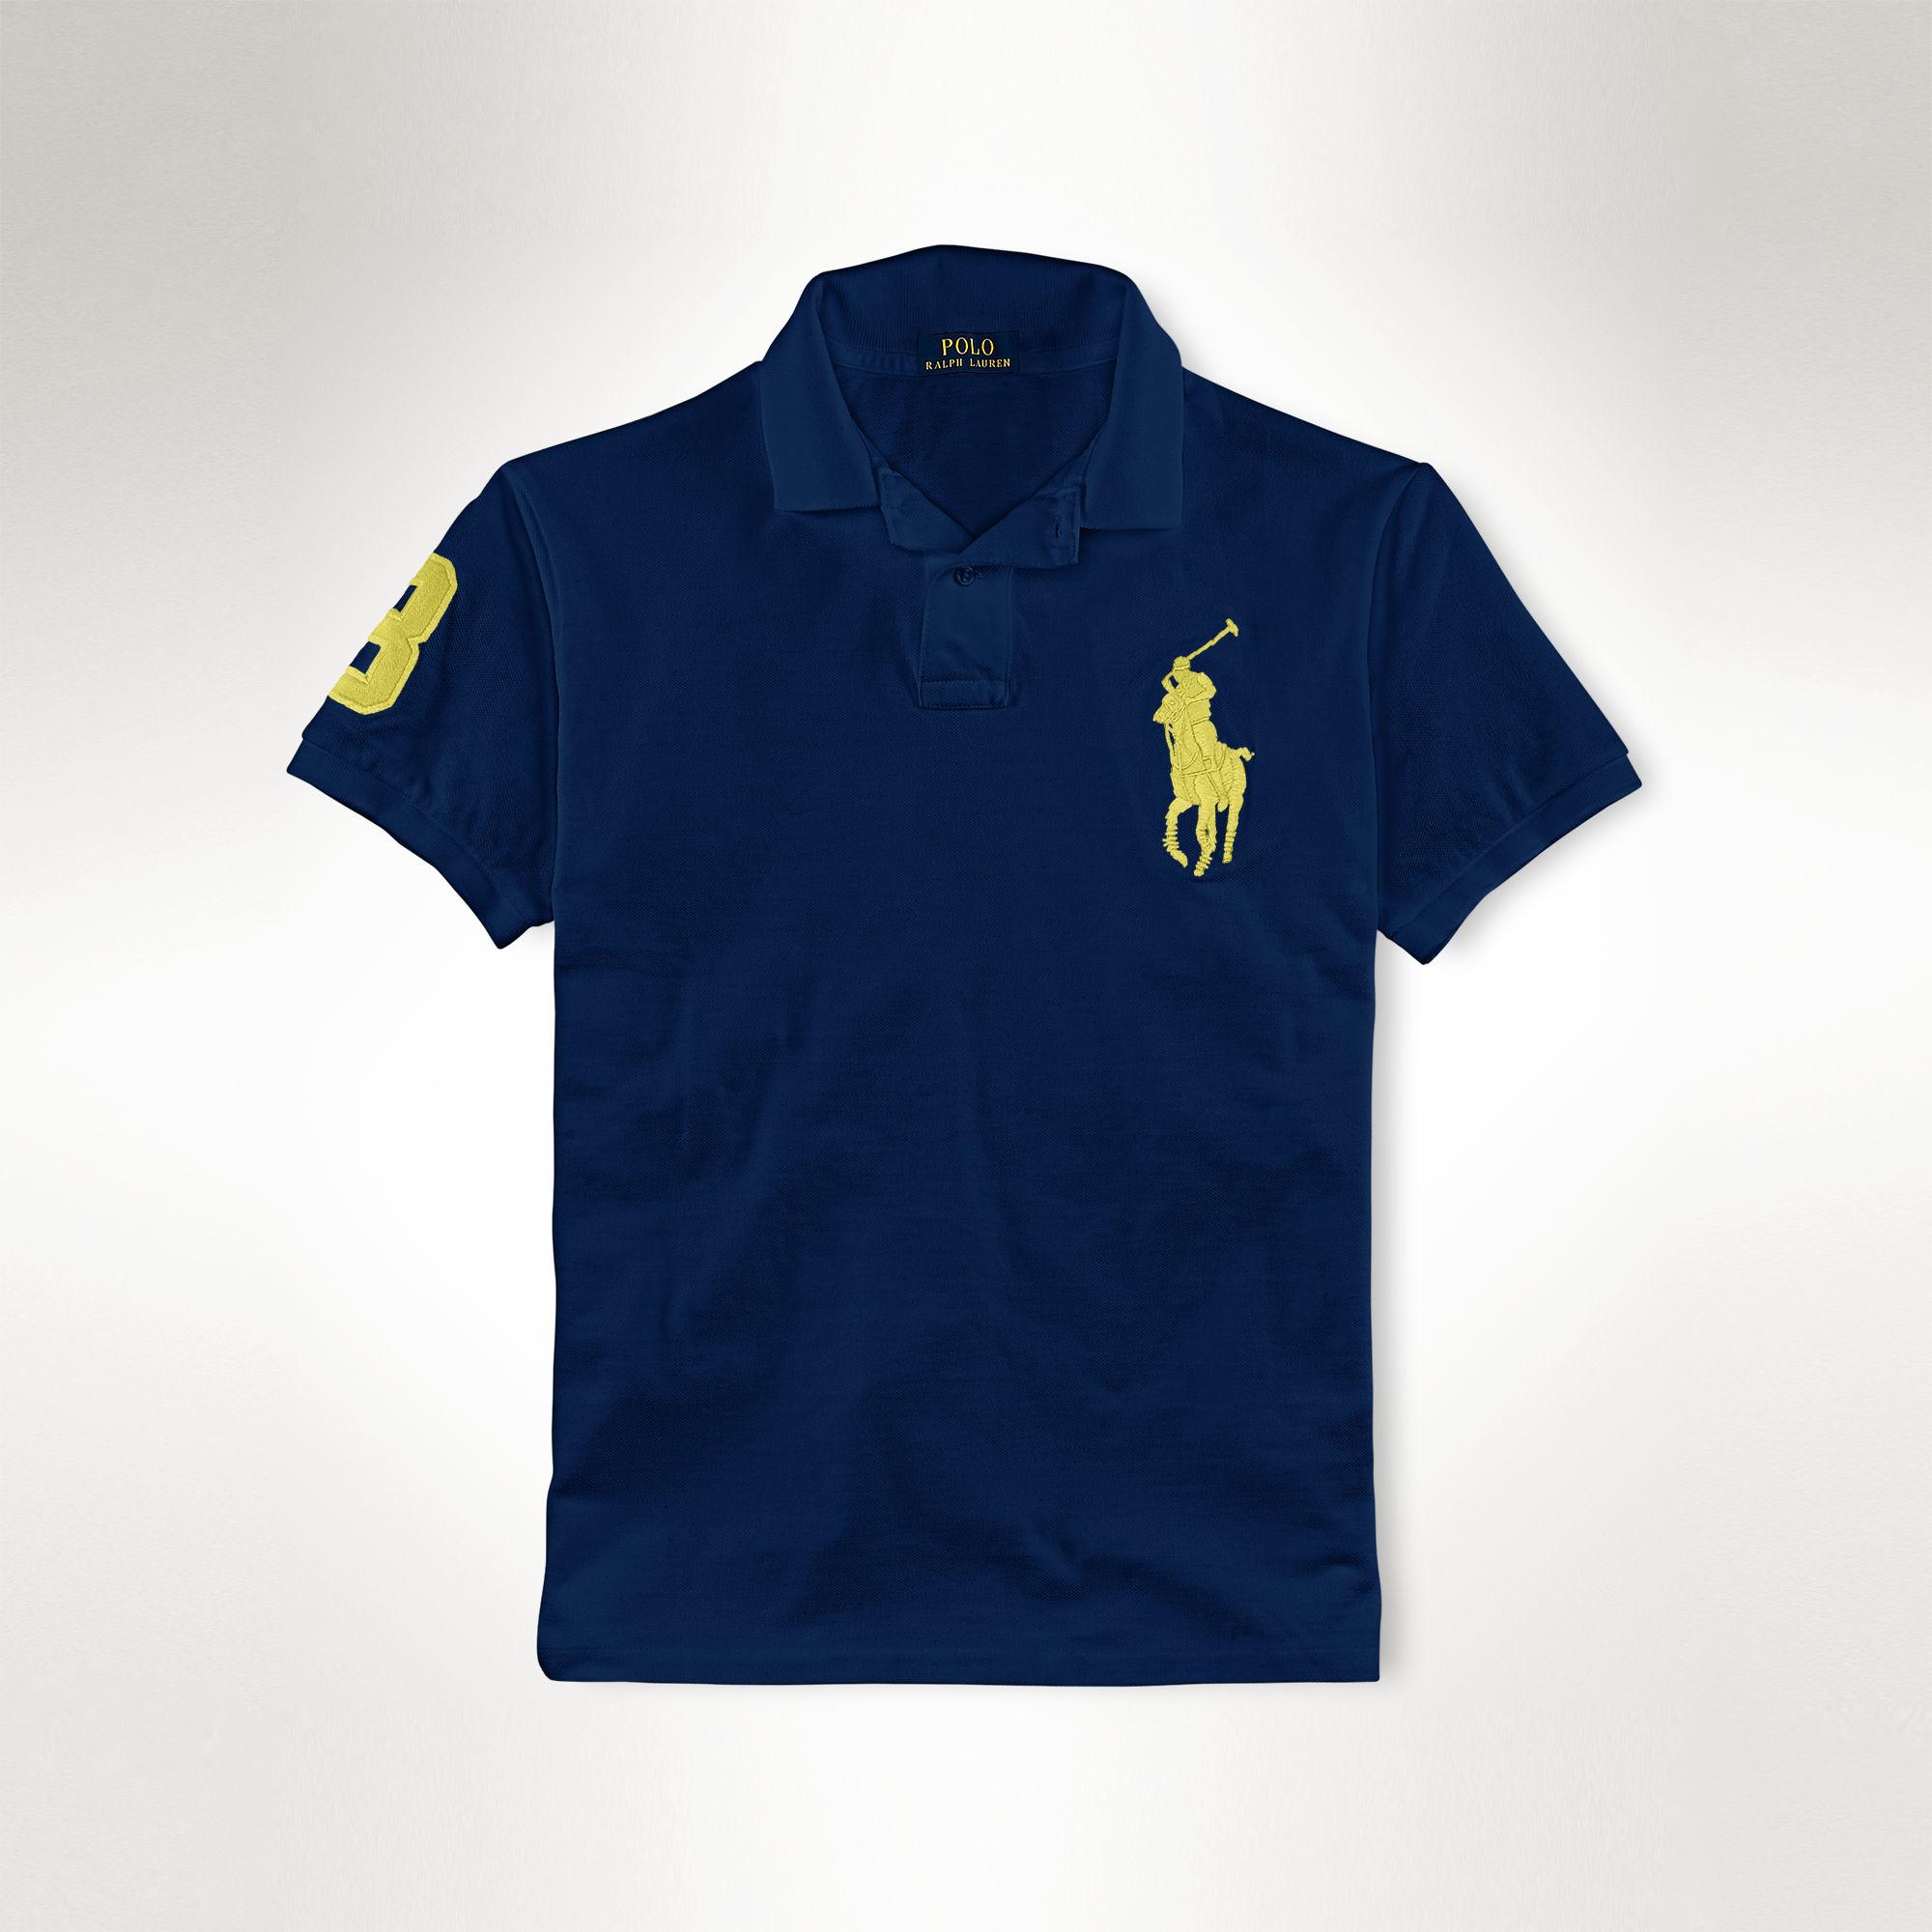 Low Price Green Ralph 63cd1 Shirt 0ac37 Neon Brand Lauren Polo 35ARq4jLc